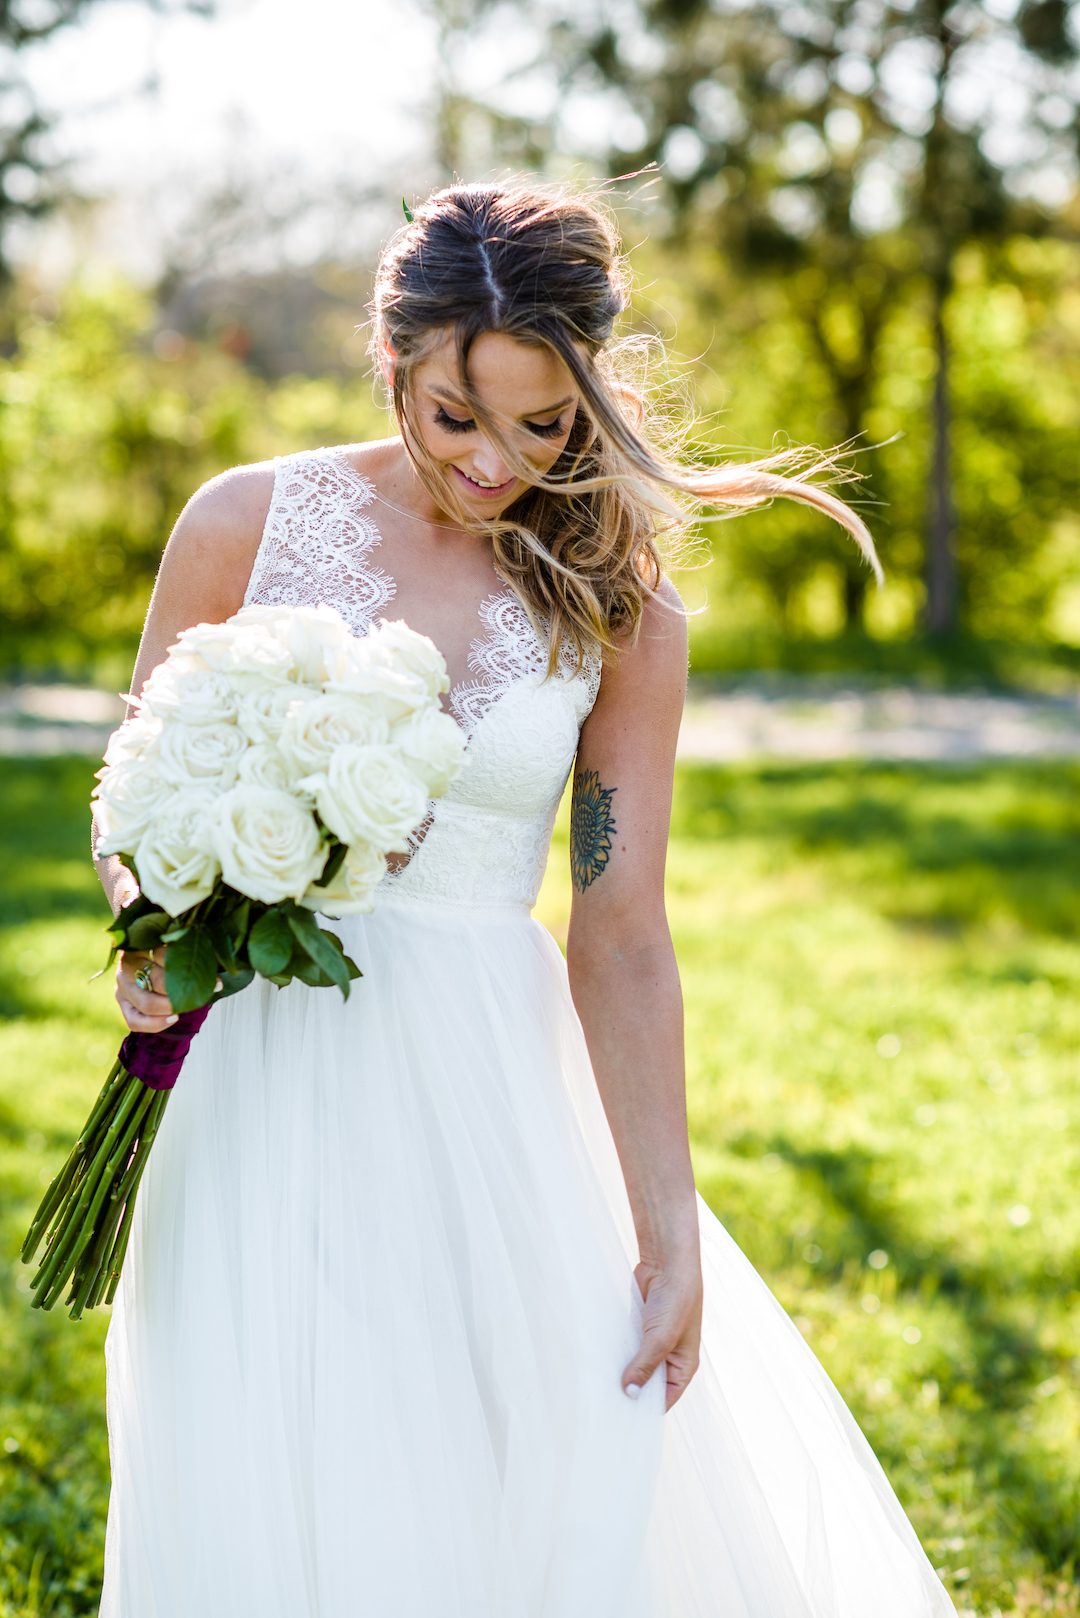 Large white floral wedding bouquet